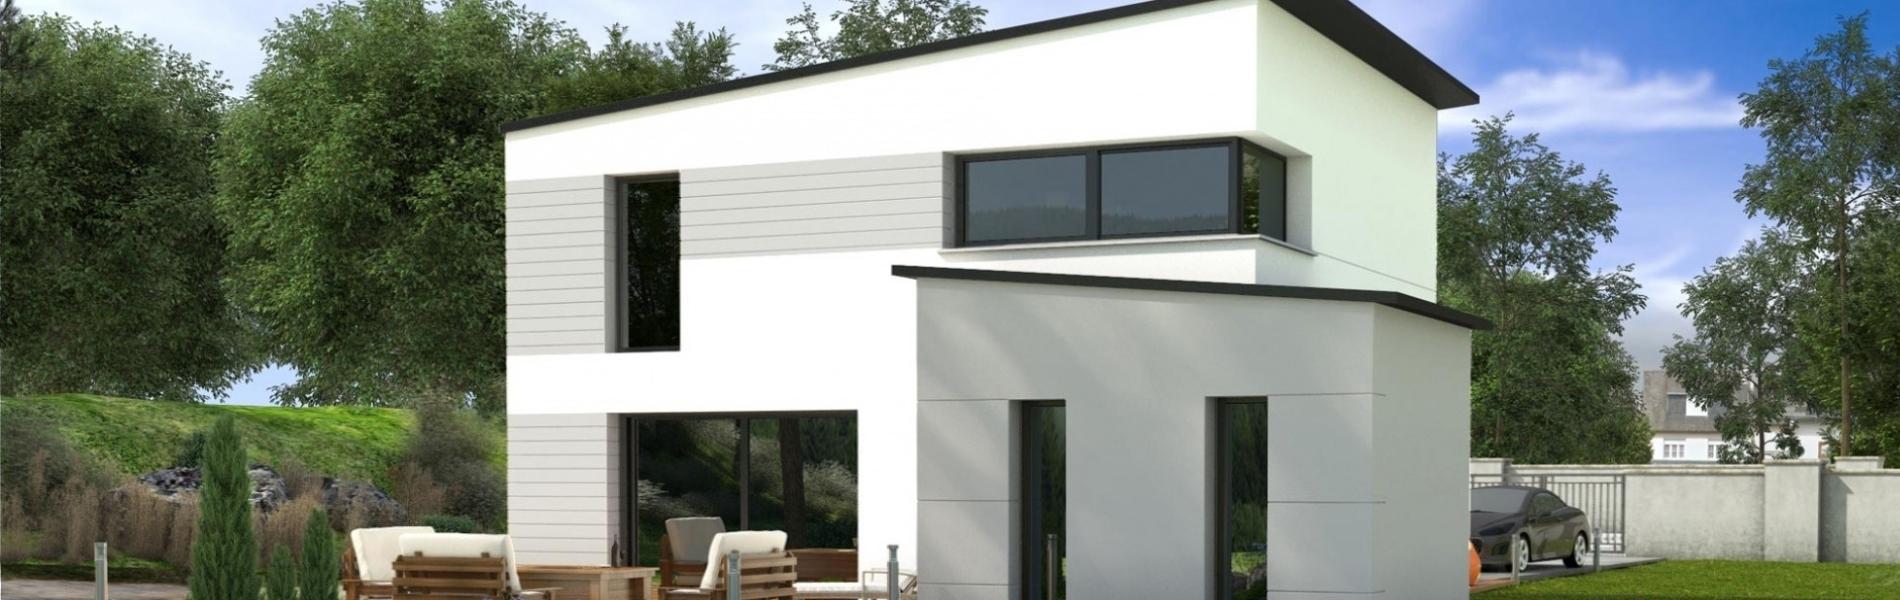 Constructeur maison moderne rennes ventana blog for Maison moderne rennes